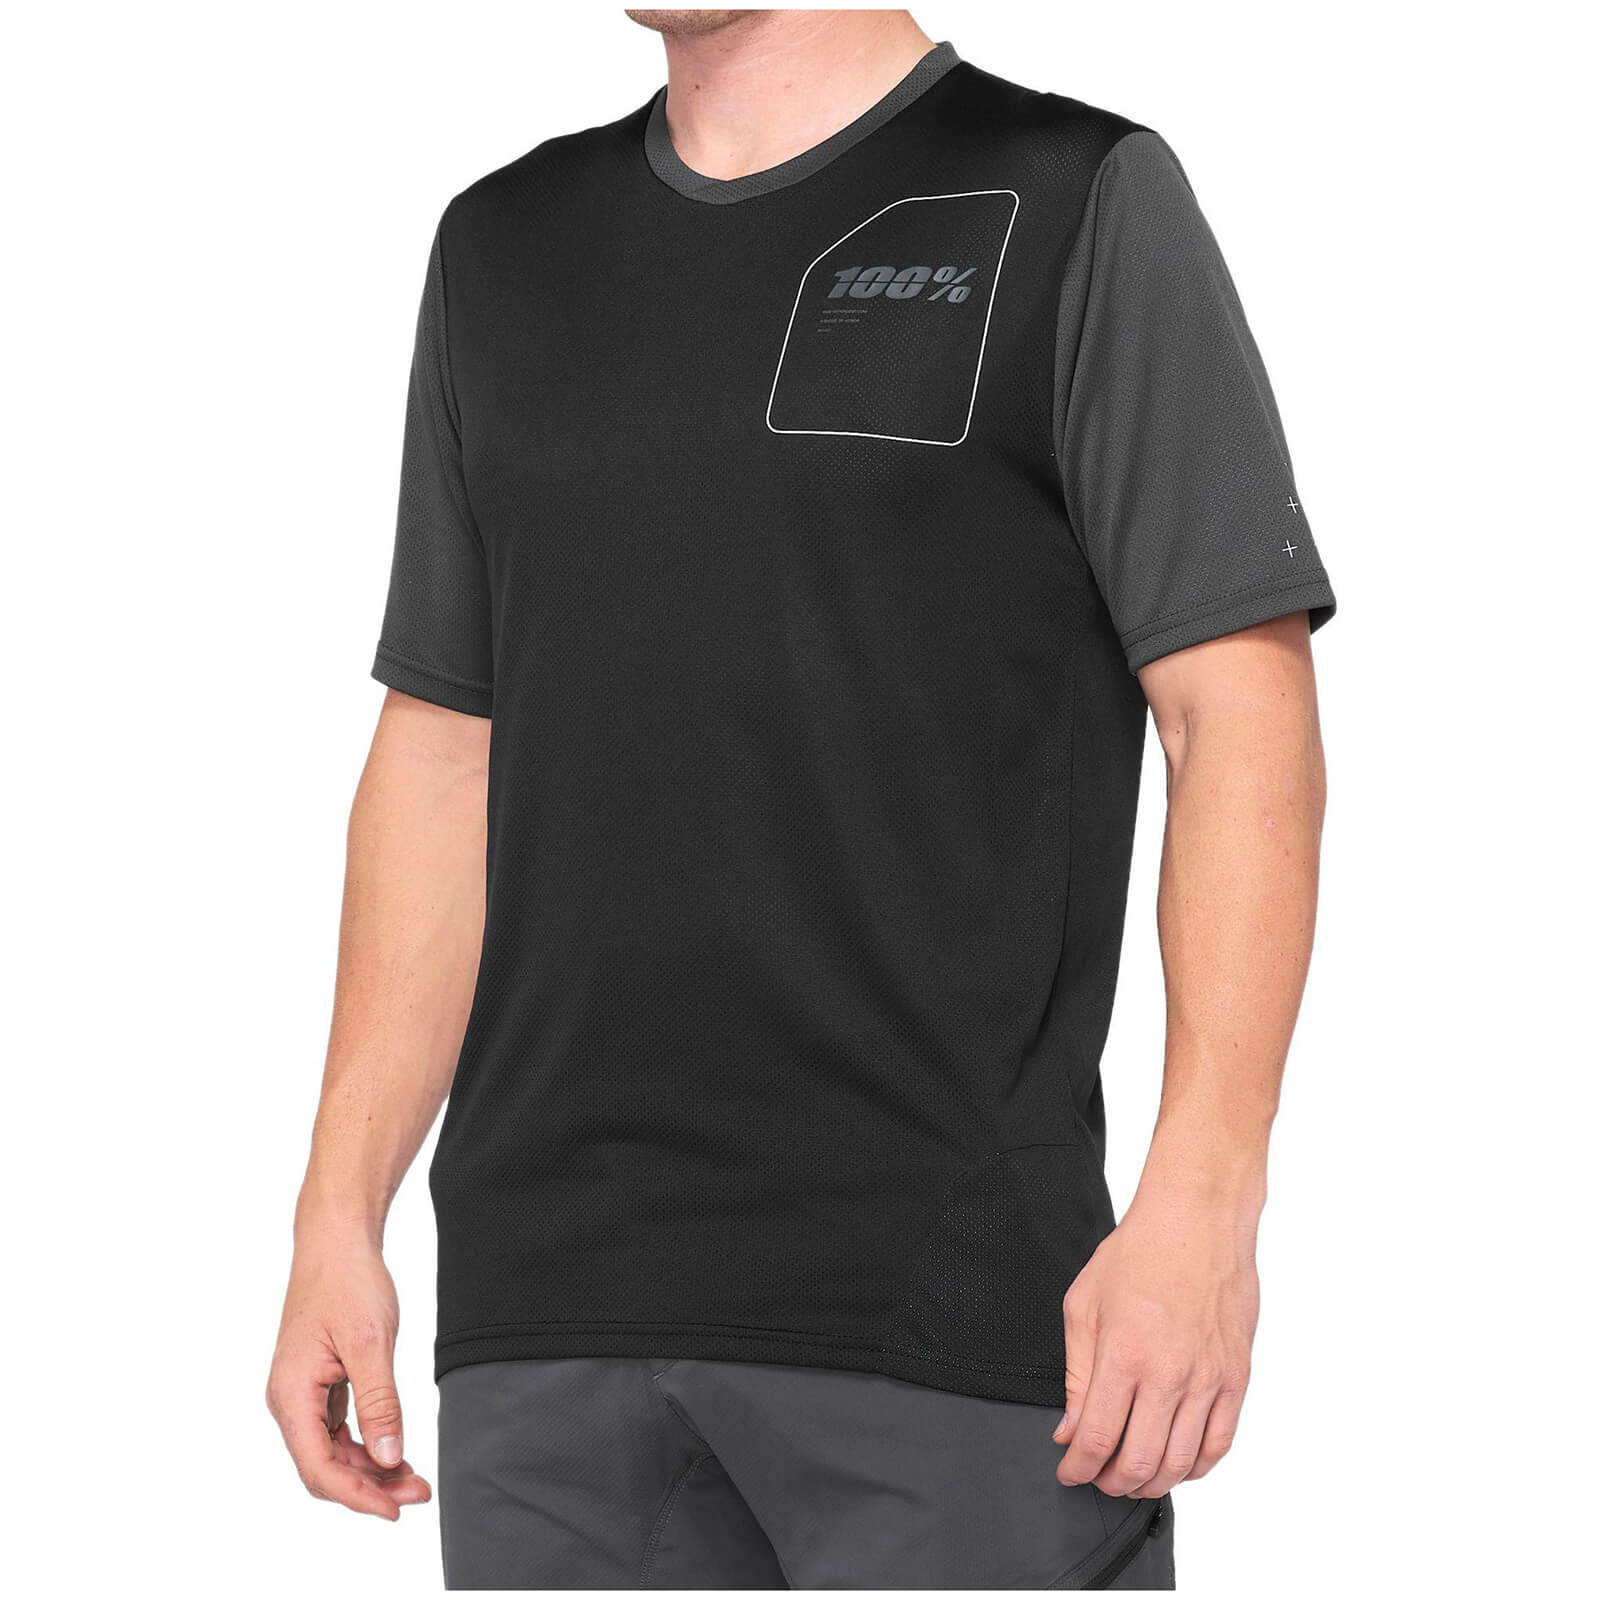 100% Ridecamp Mtb Jersey - L - Charcoal/black